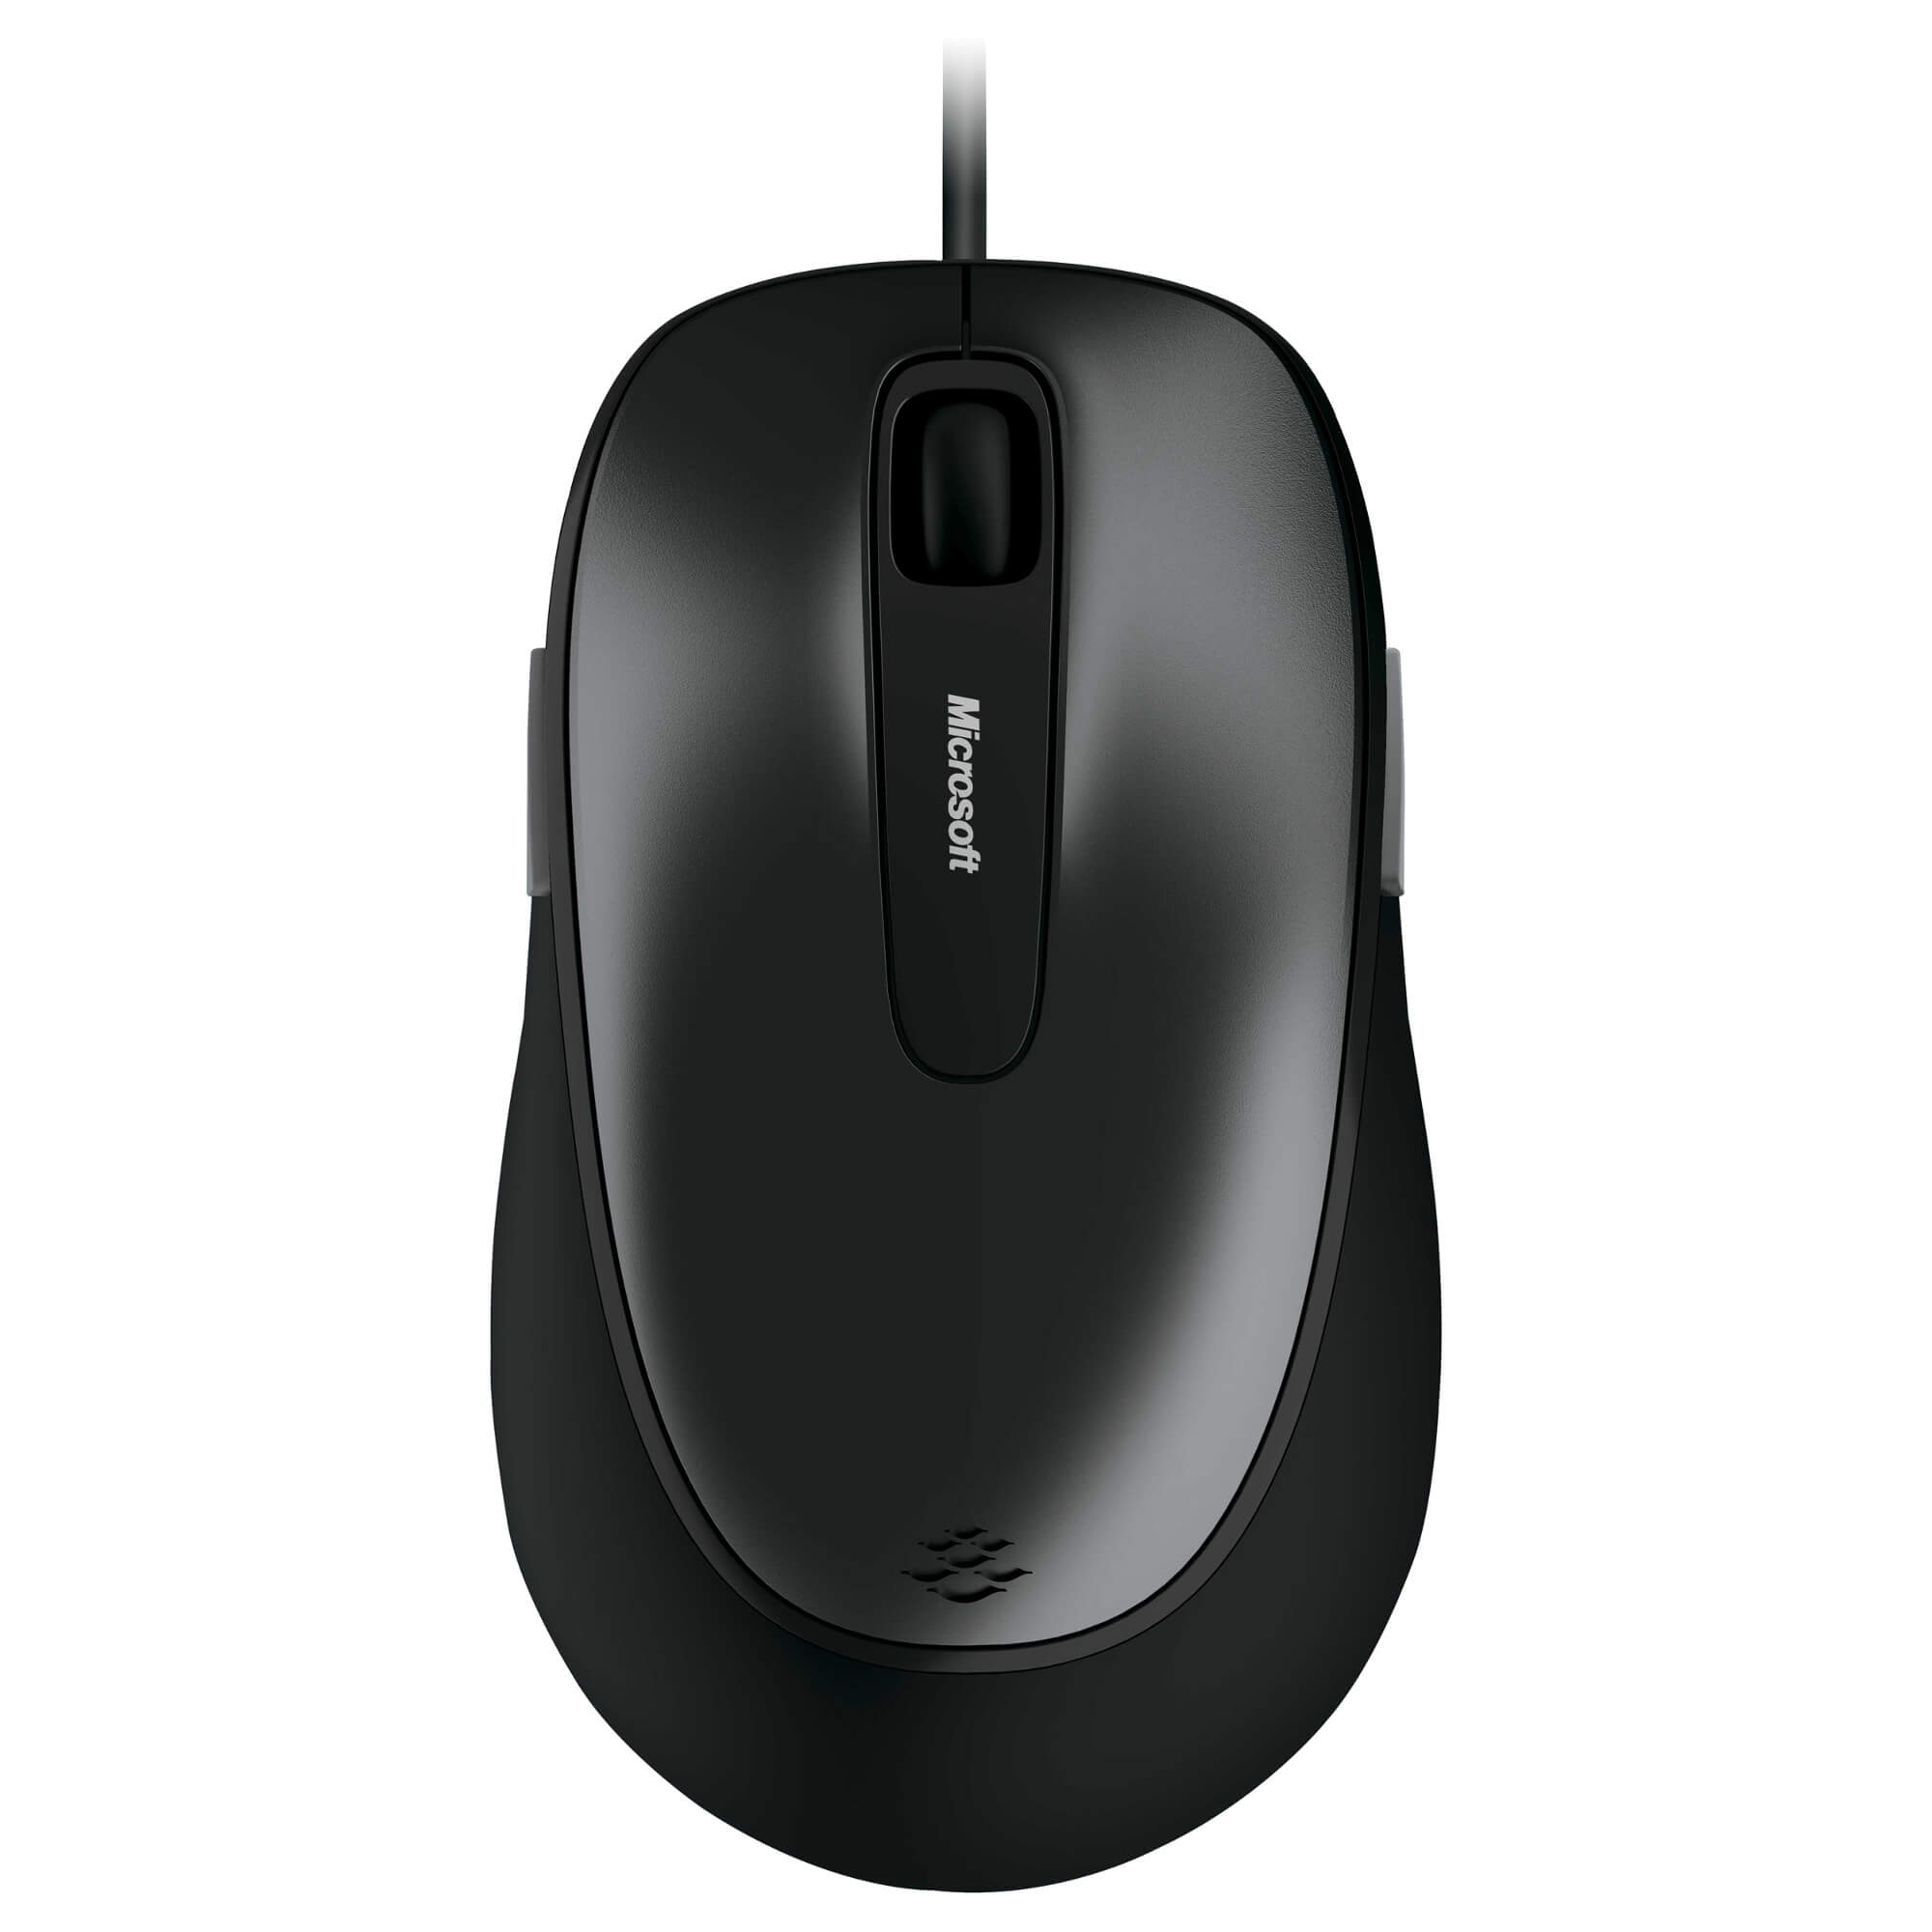 Mouse USB Wired Microsoft Comfort 4500, Negru